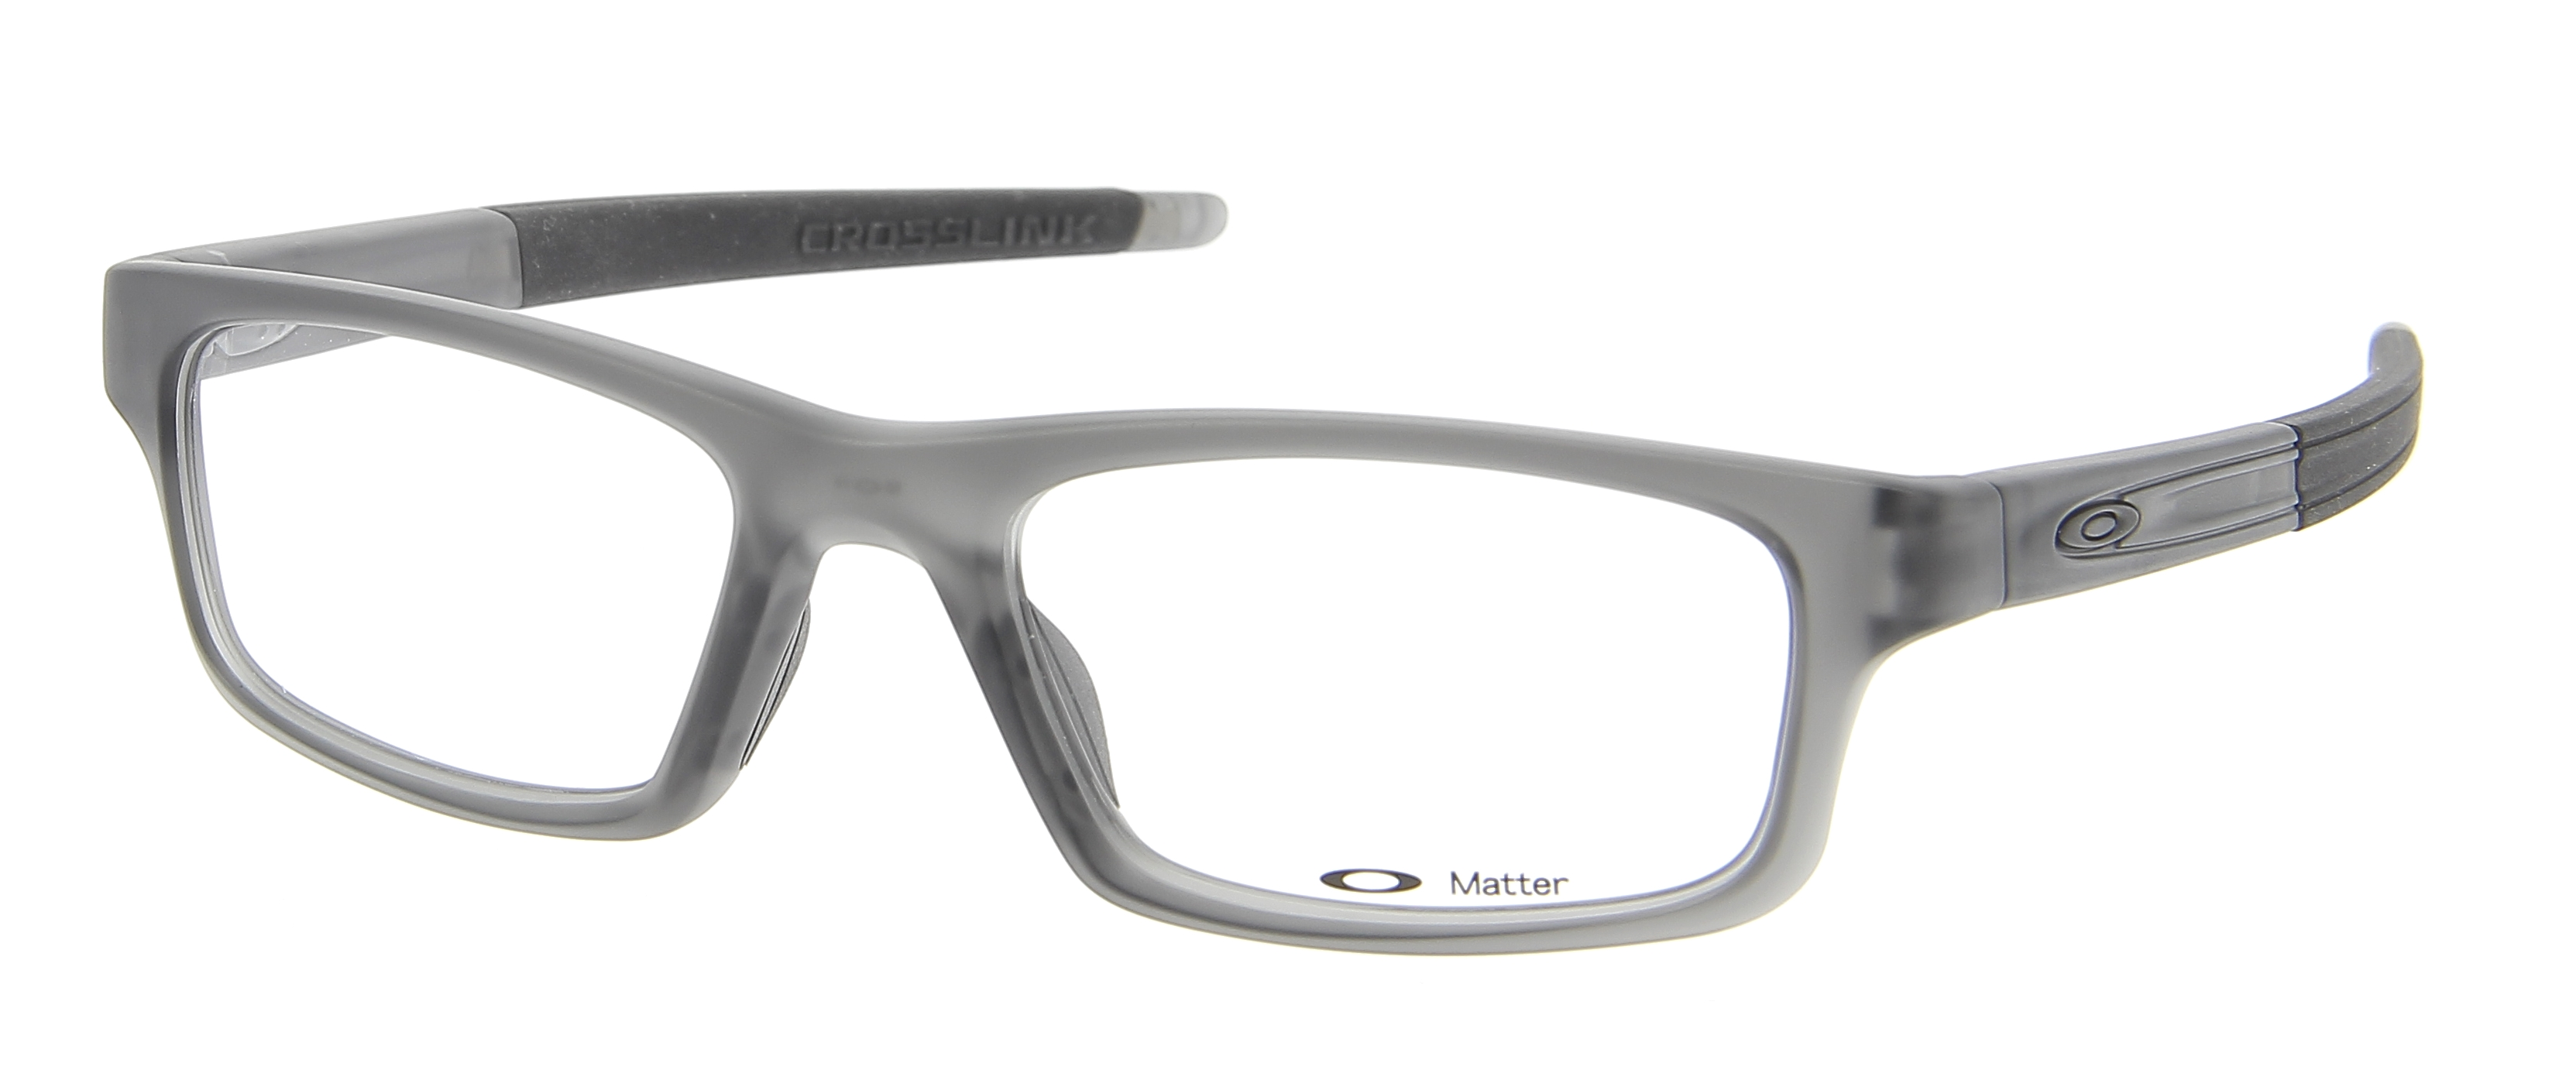 oakley sports glasses izzy  2016 oakley sports glasses full frame